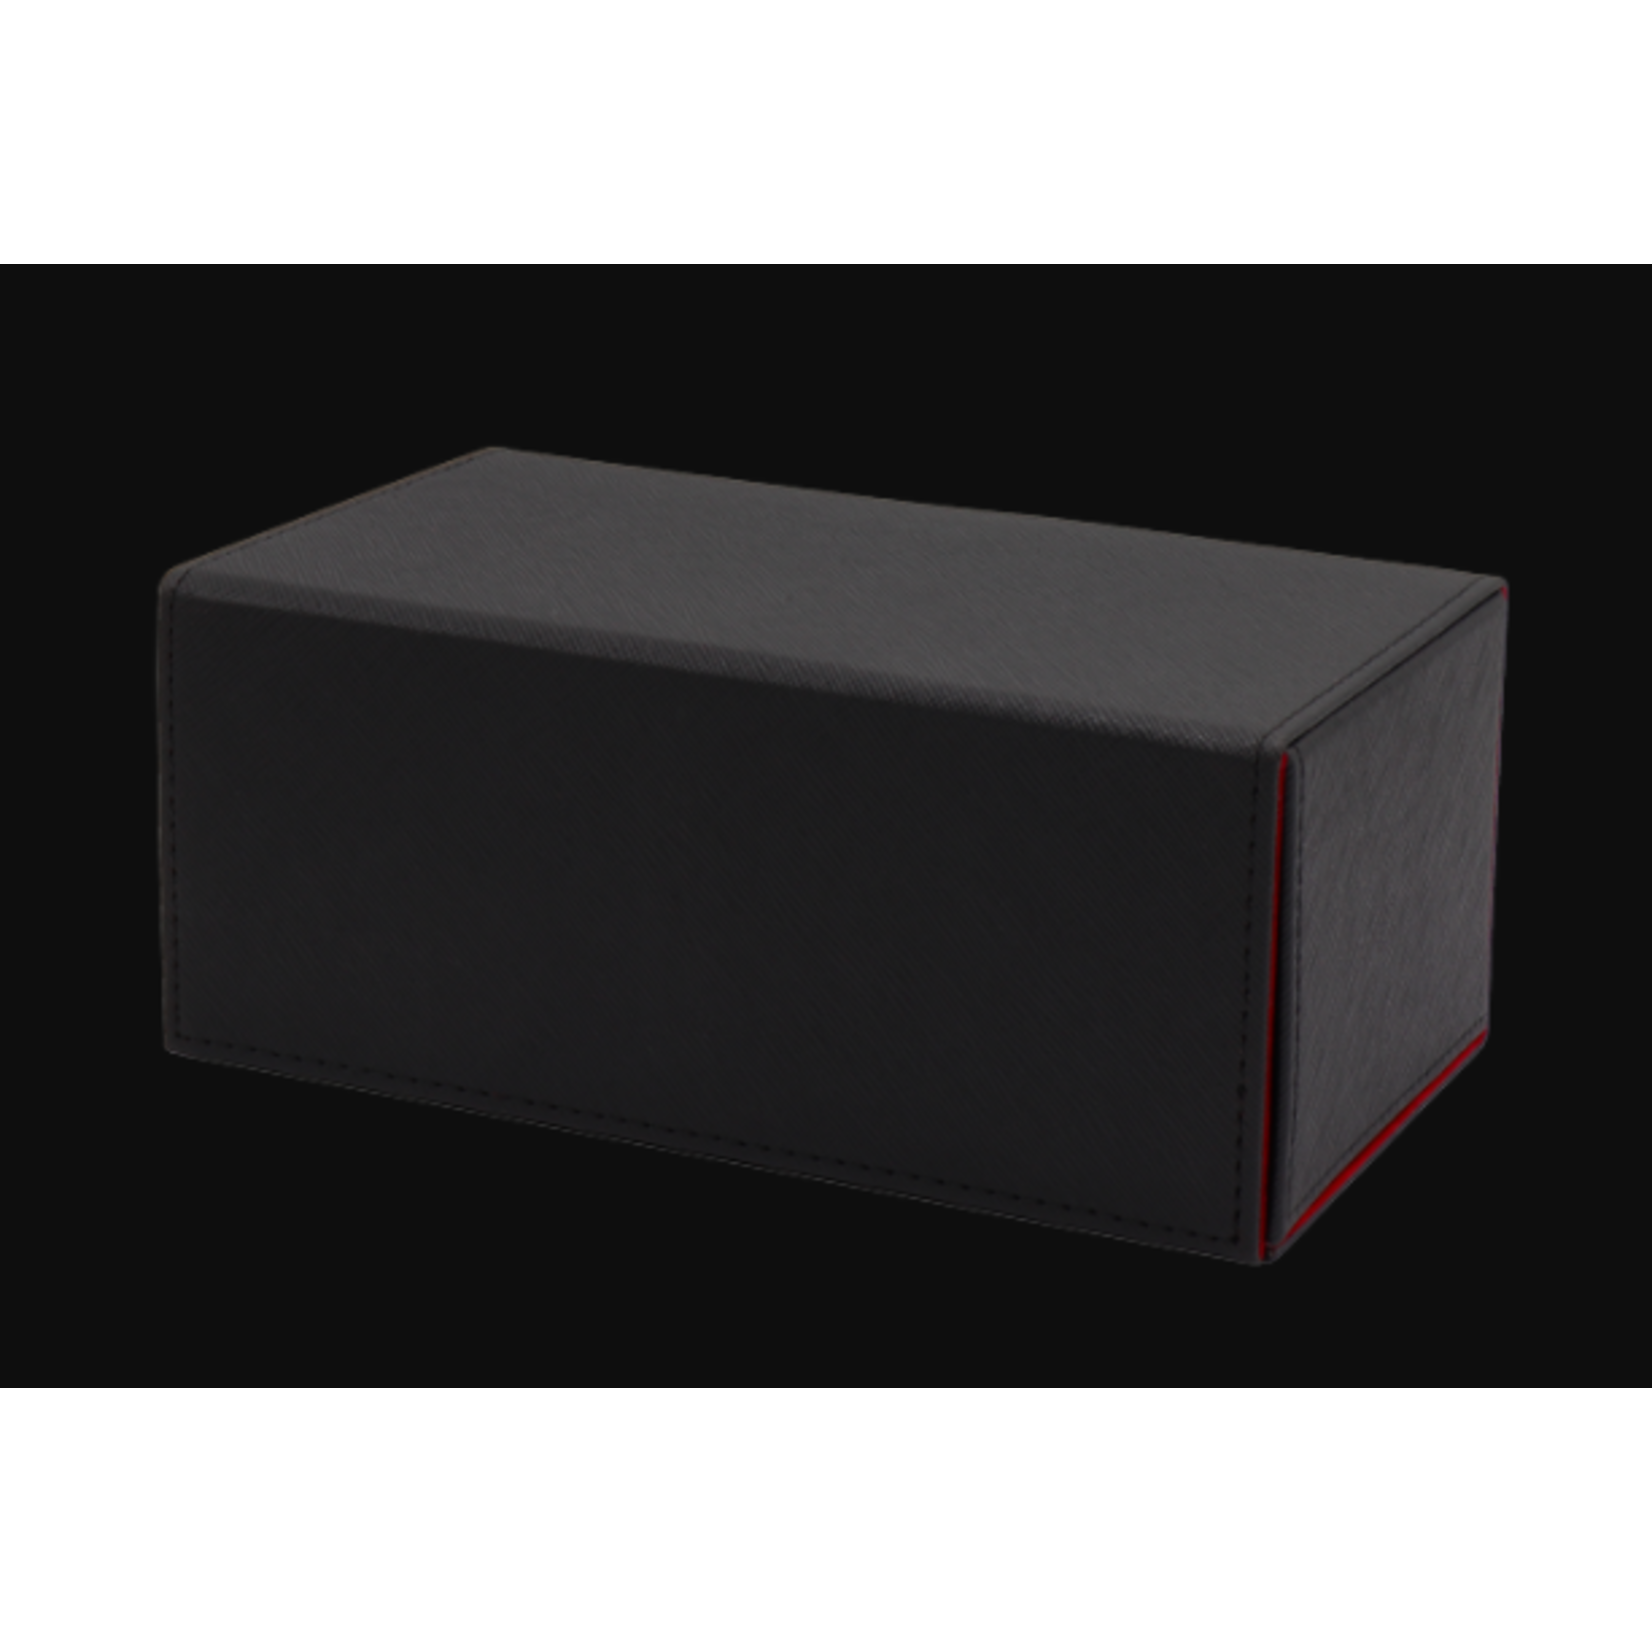 Dex Protection Dex Protection: Creation Large Black Deck Box